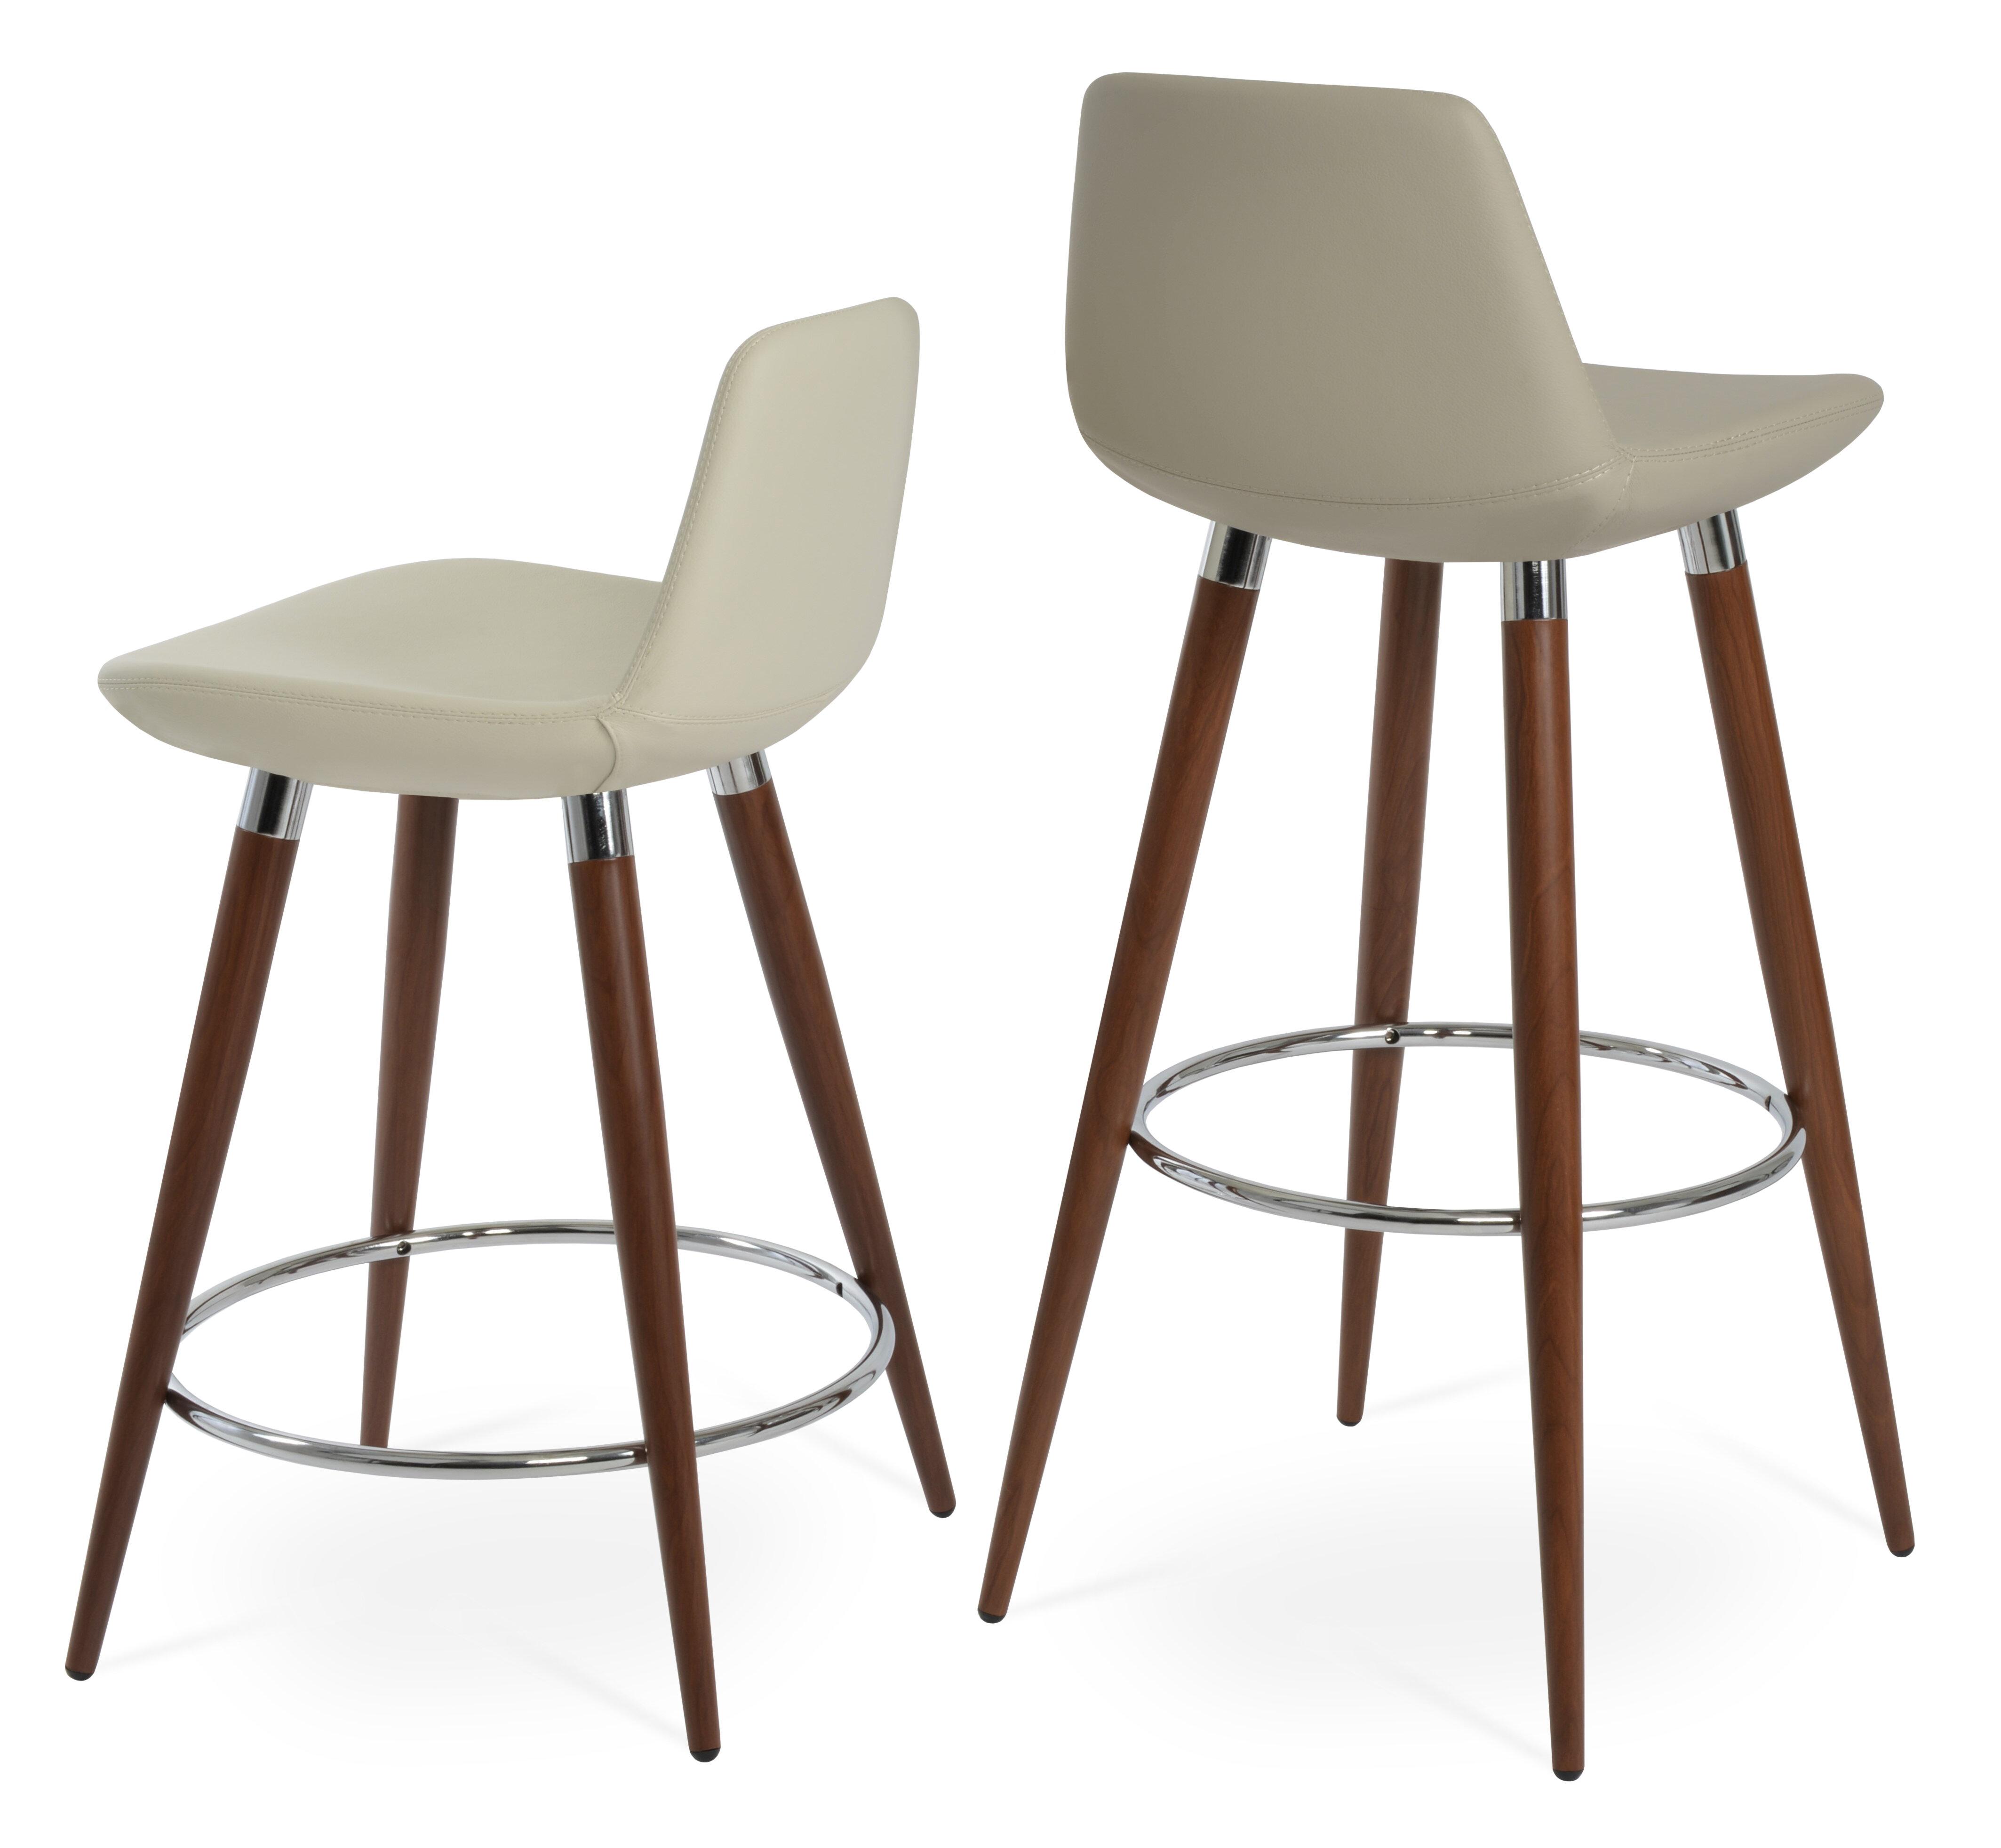 Astonishing Pera Ana Counter Stool Inzonedesignstudio Interior Chair Design Inzonedesignstudiocom